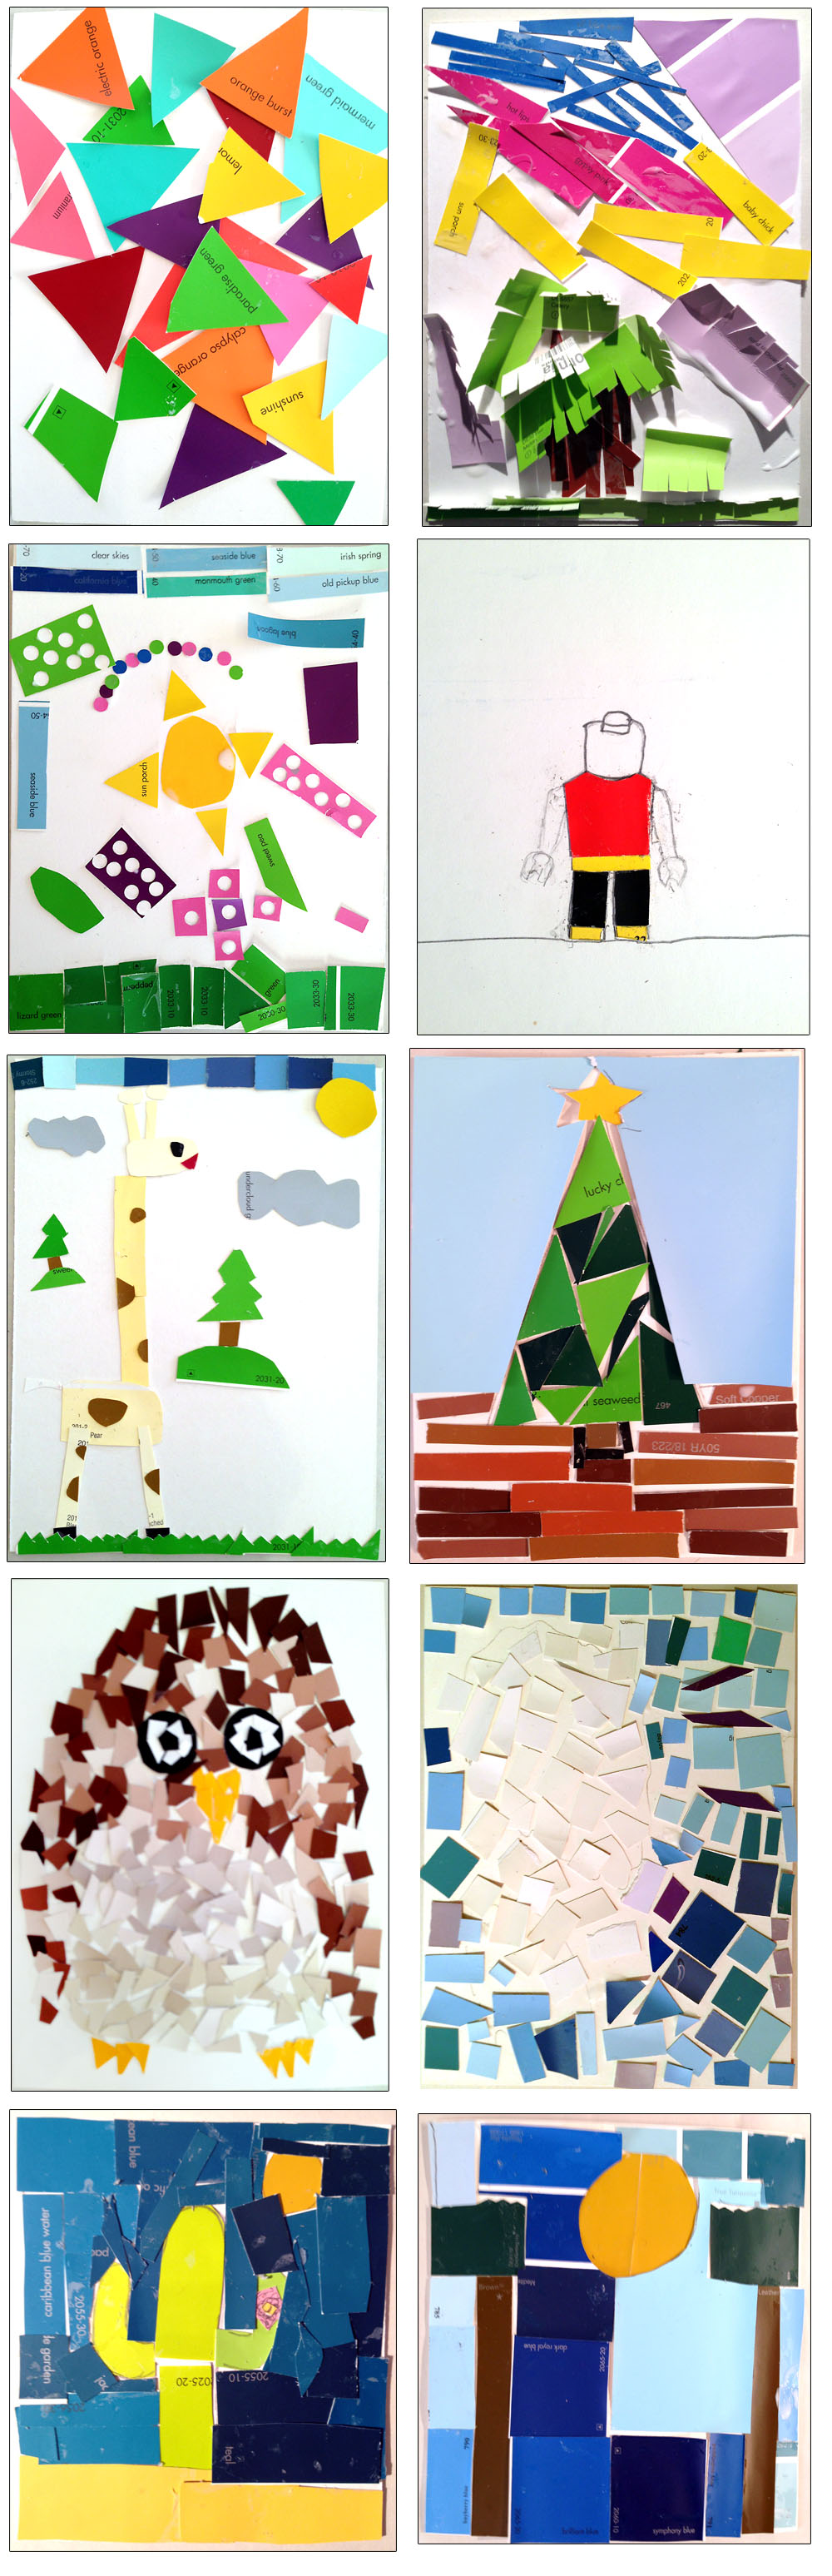 paint chip mosaic_m j bronstein_artlab_cmca